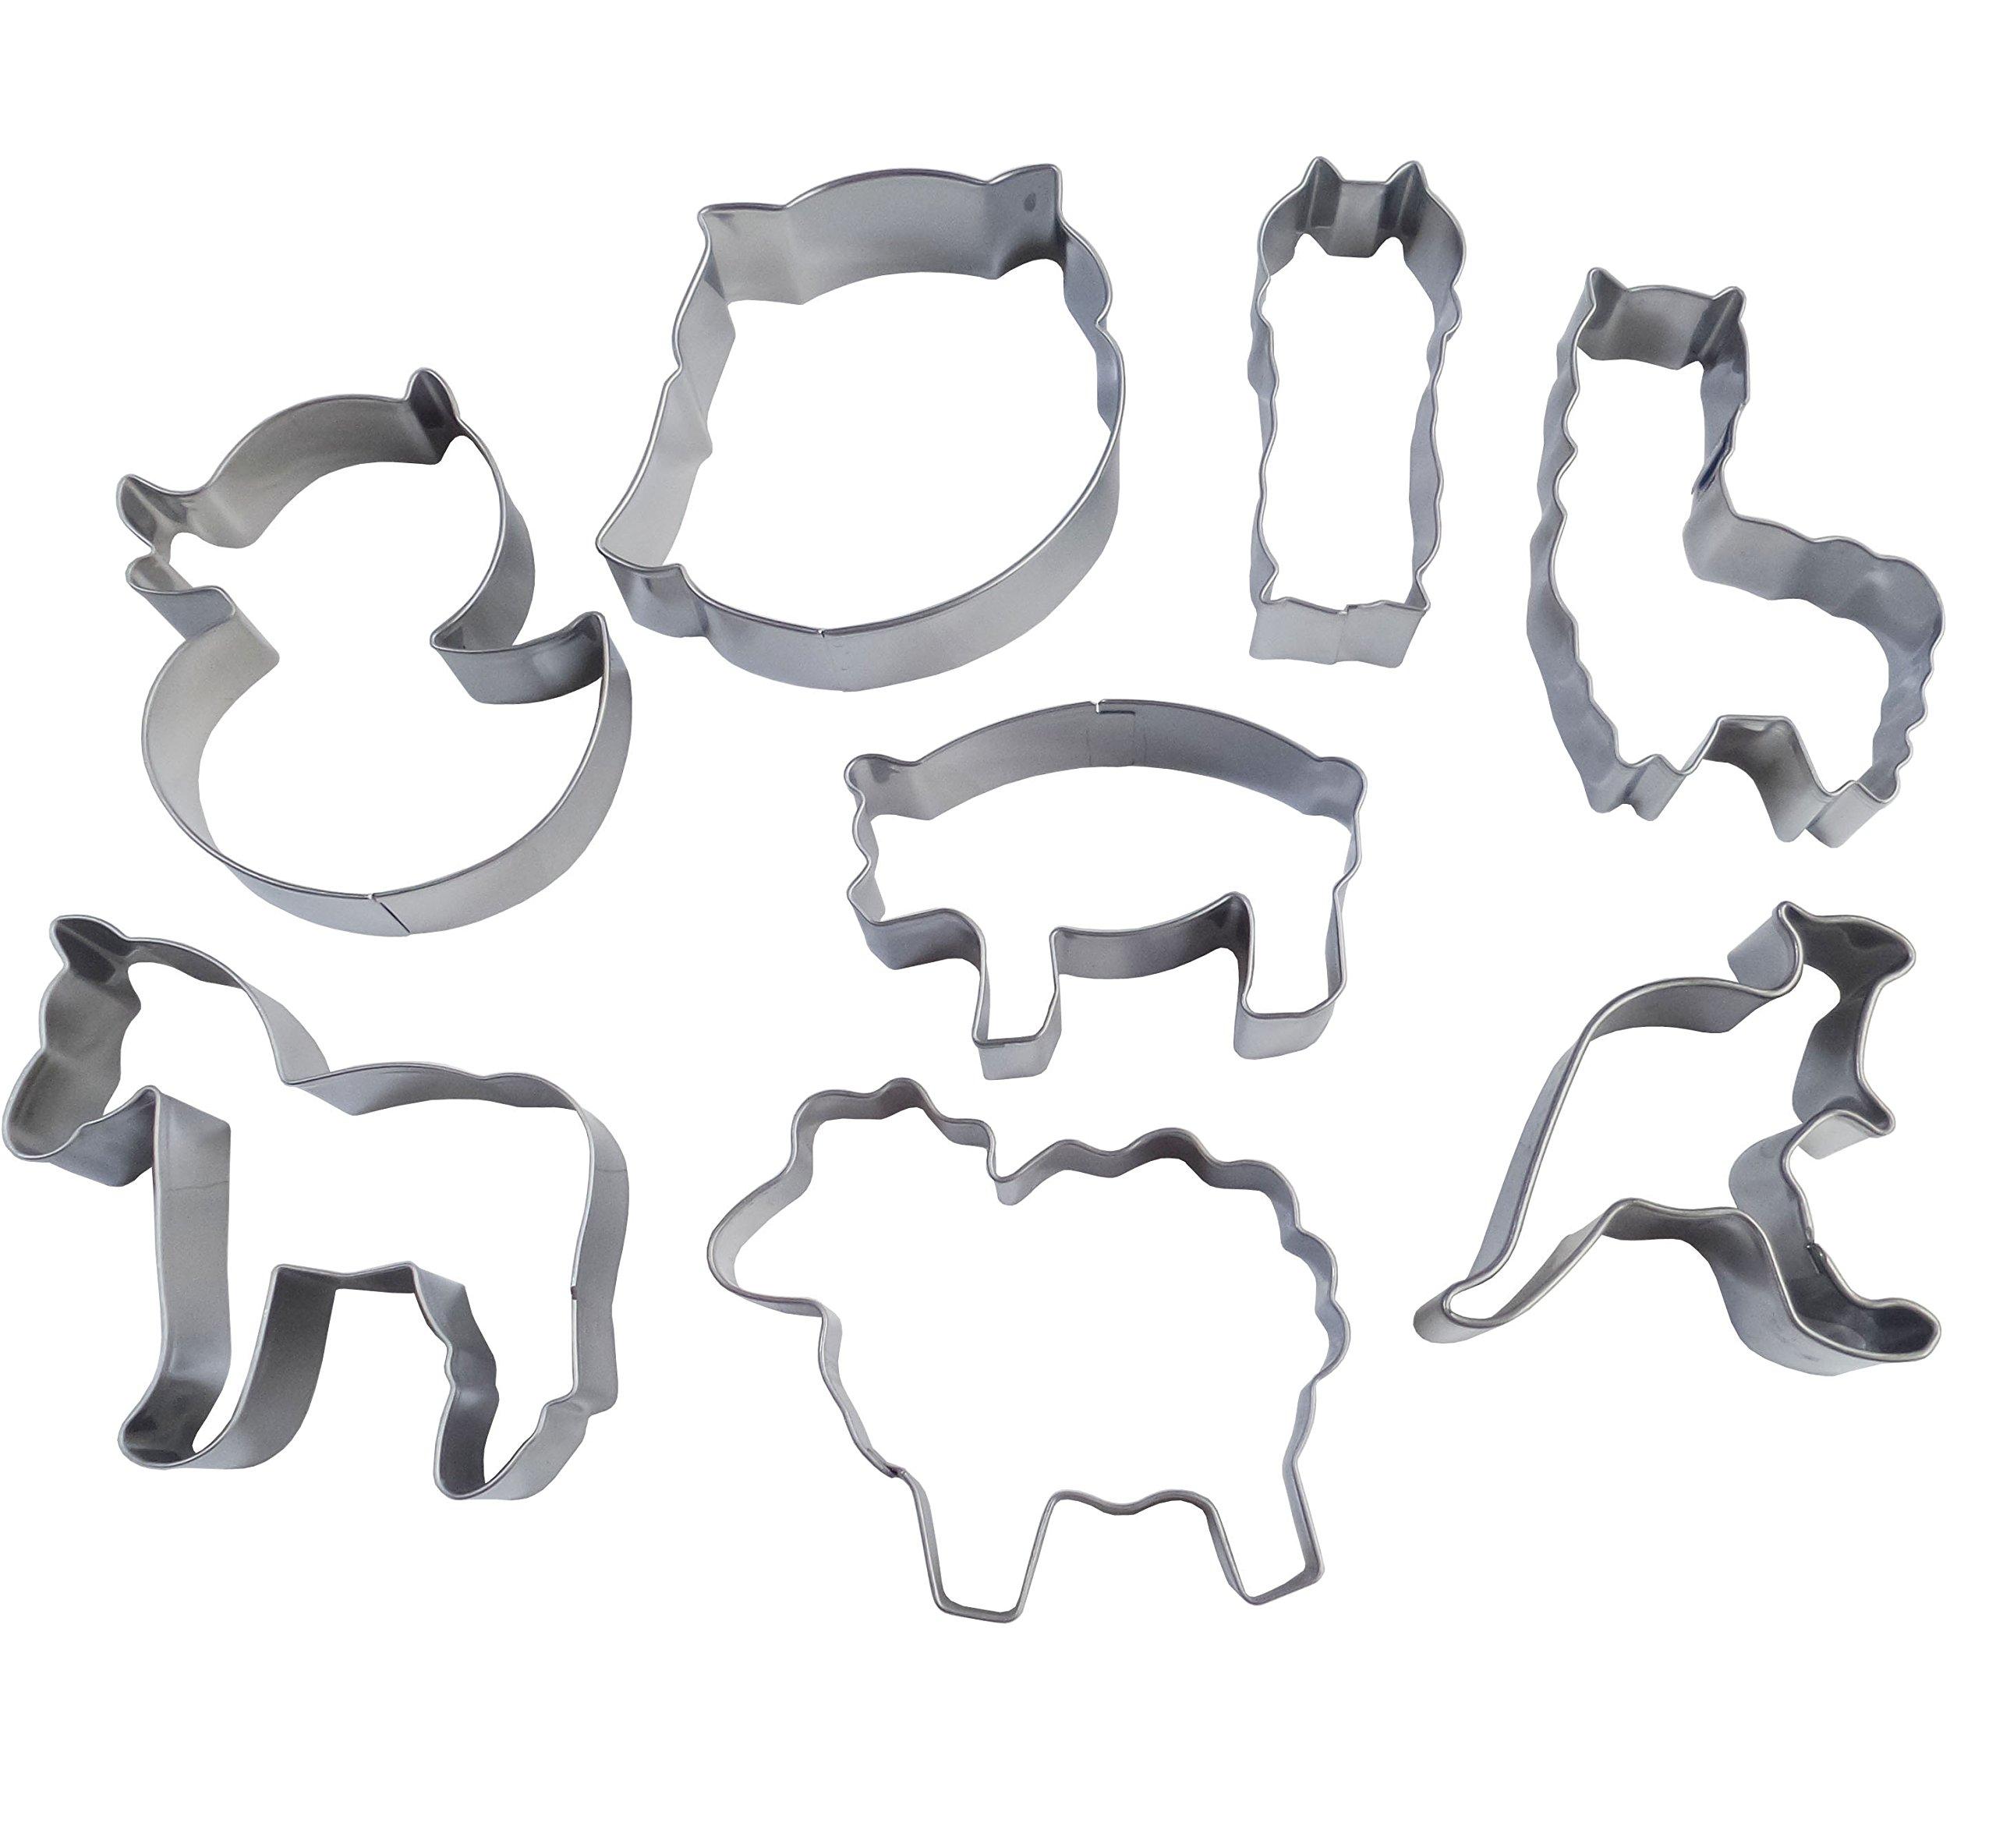 Yunko 8pcs Farm Animals Cartoon Stainless Steel Cookie Cutter Fondant Cutter Cake Decorating Tools Sheep Horse Owl Pig Duck Kangaroo Alpaca